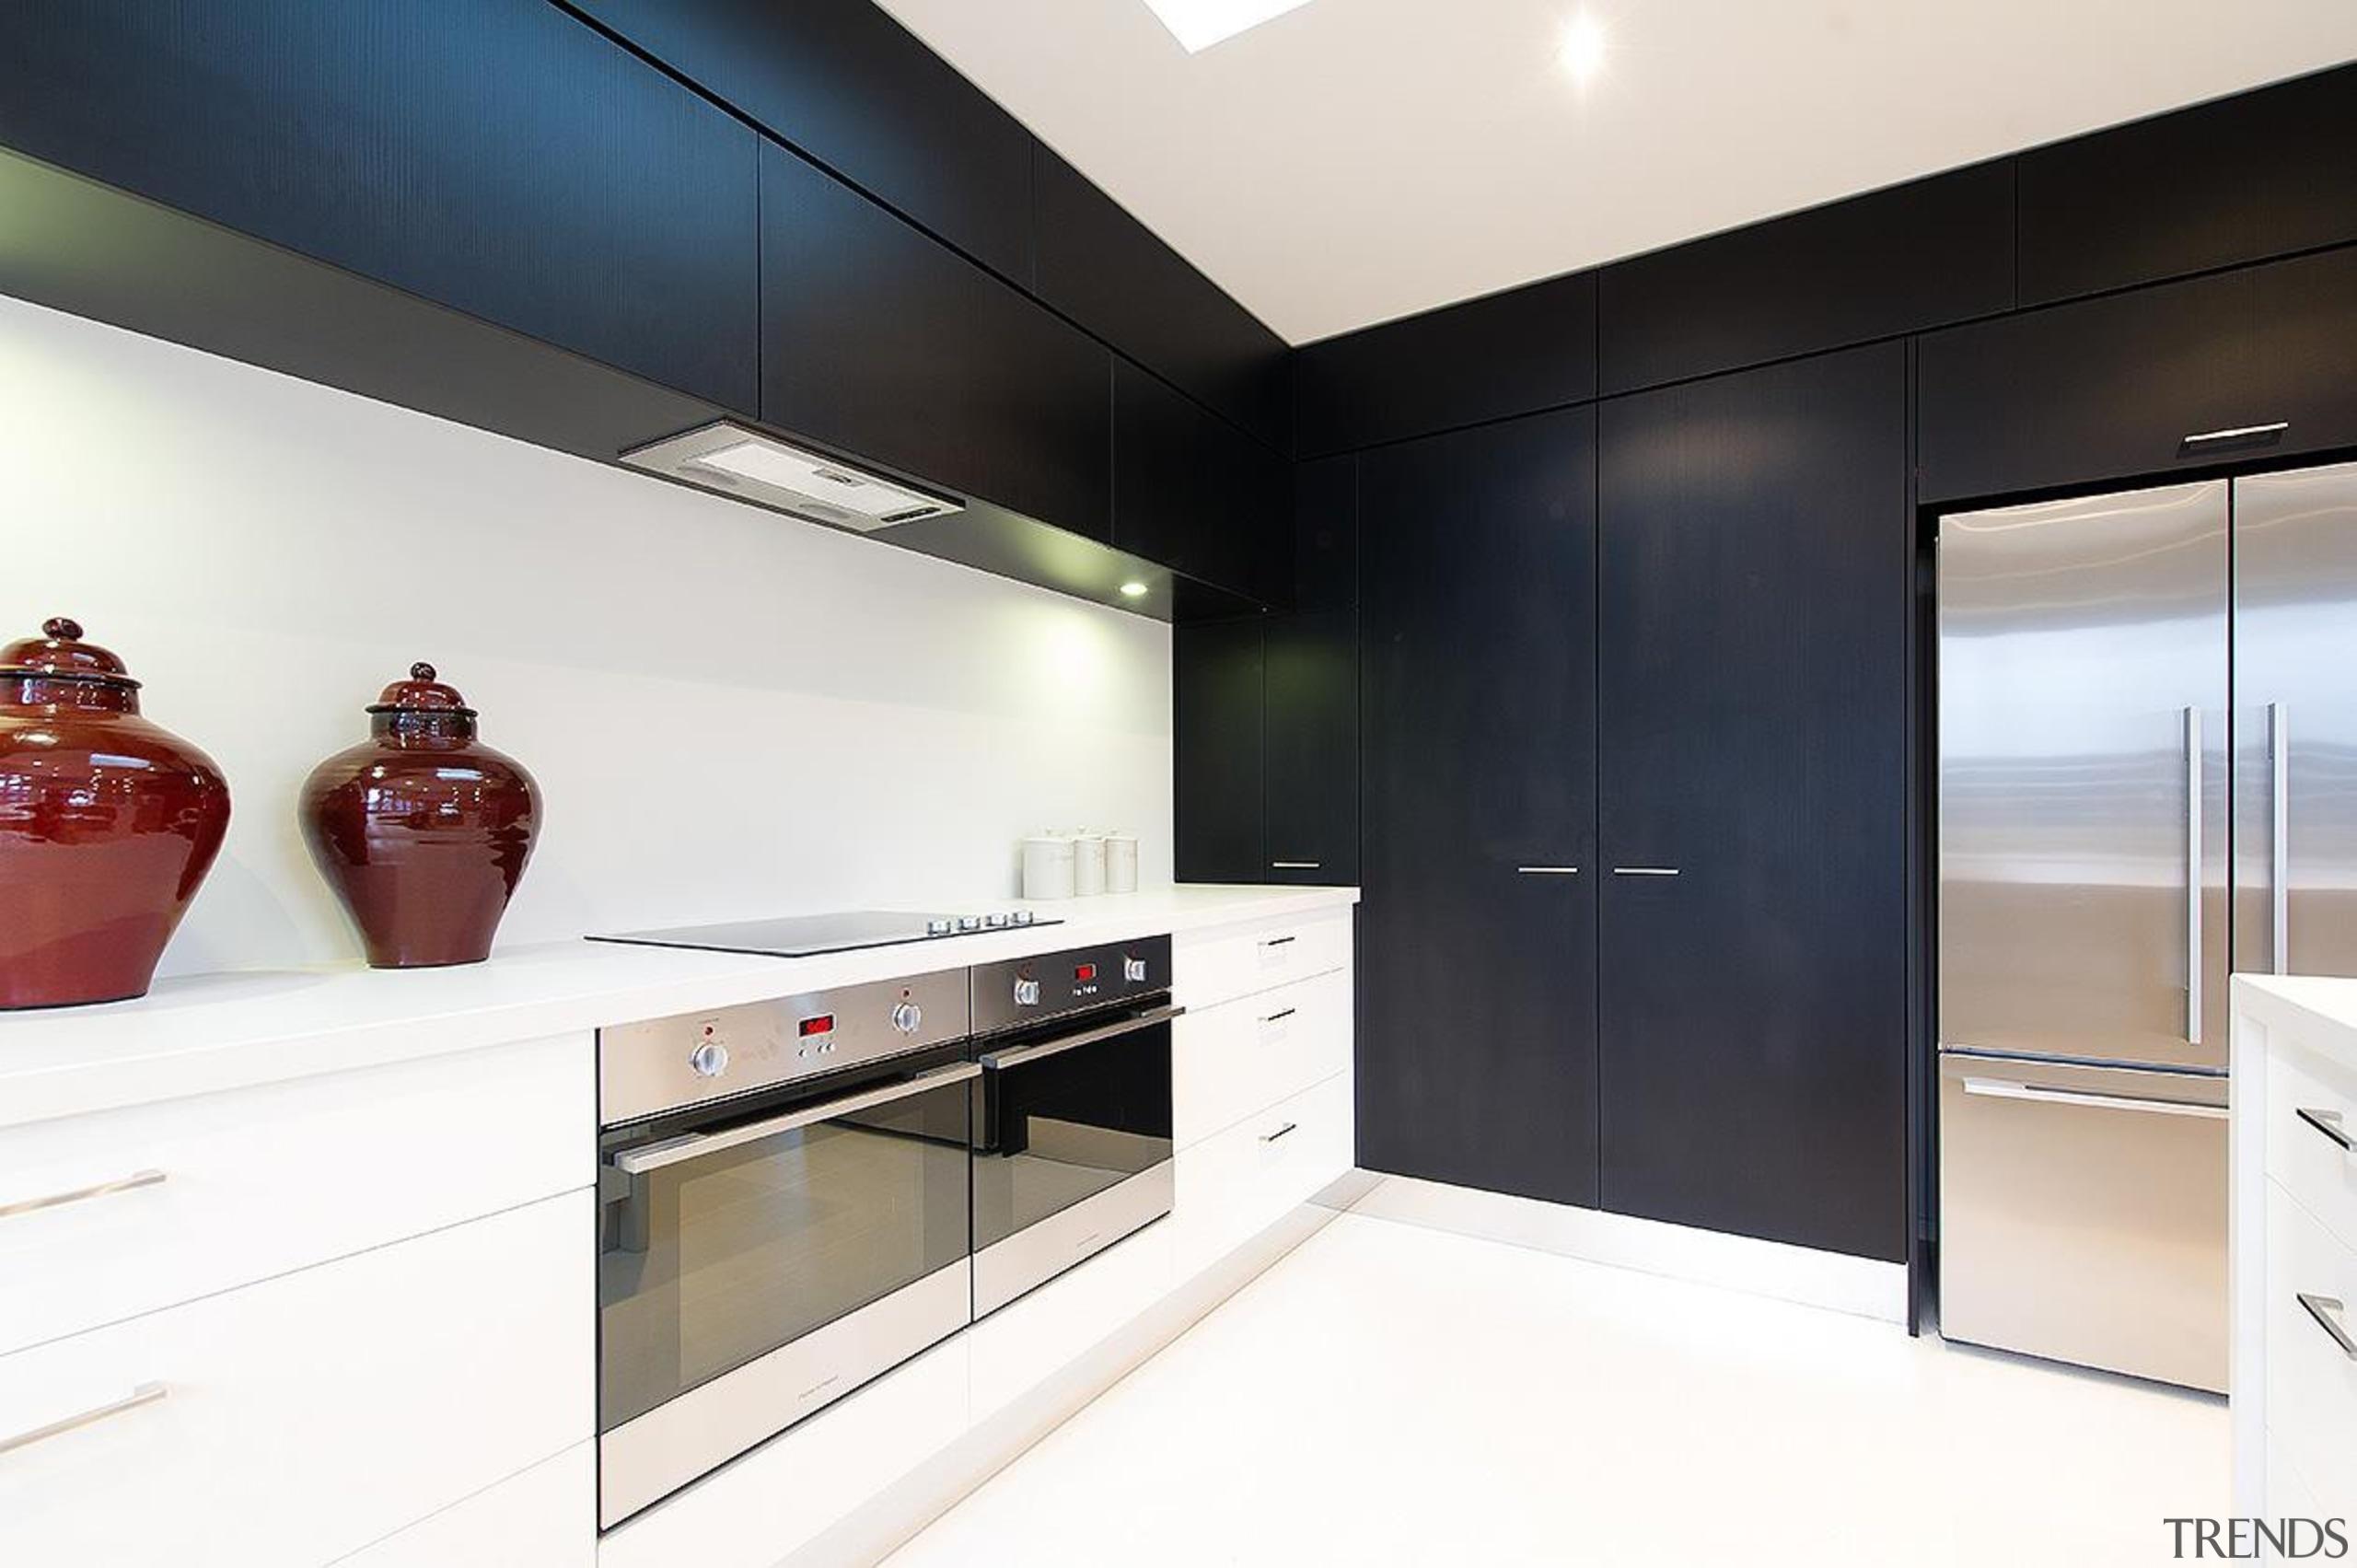 For more information, please visit www.gjgardner.co.nz countertop, interior design, kitchen, room, white, black